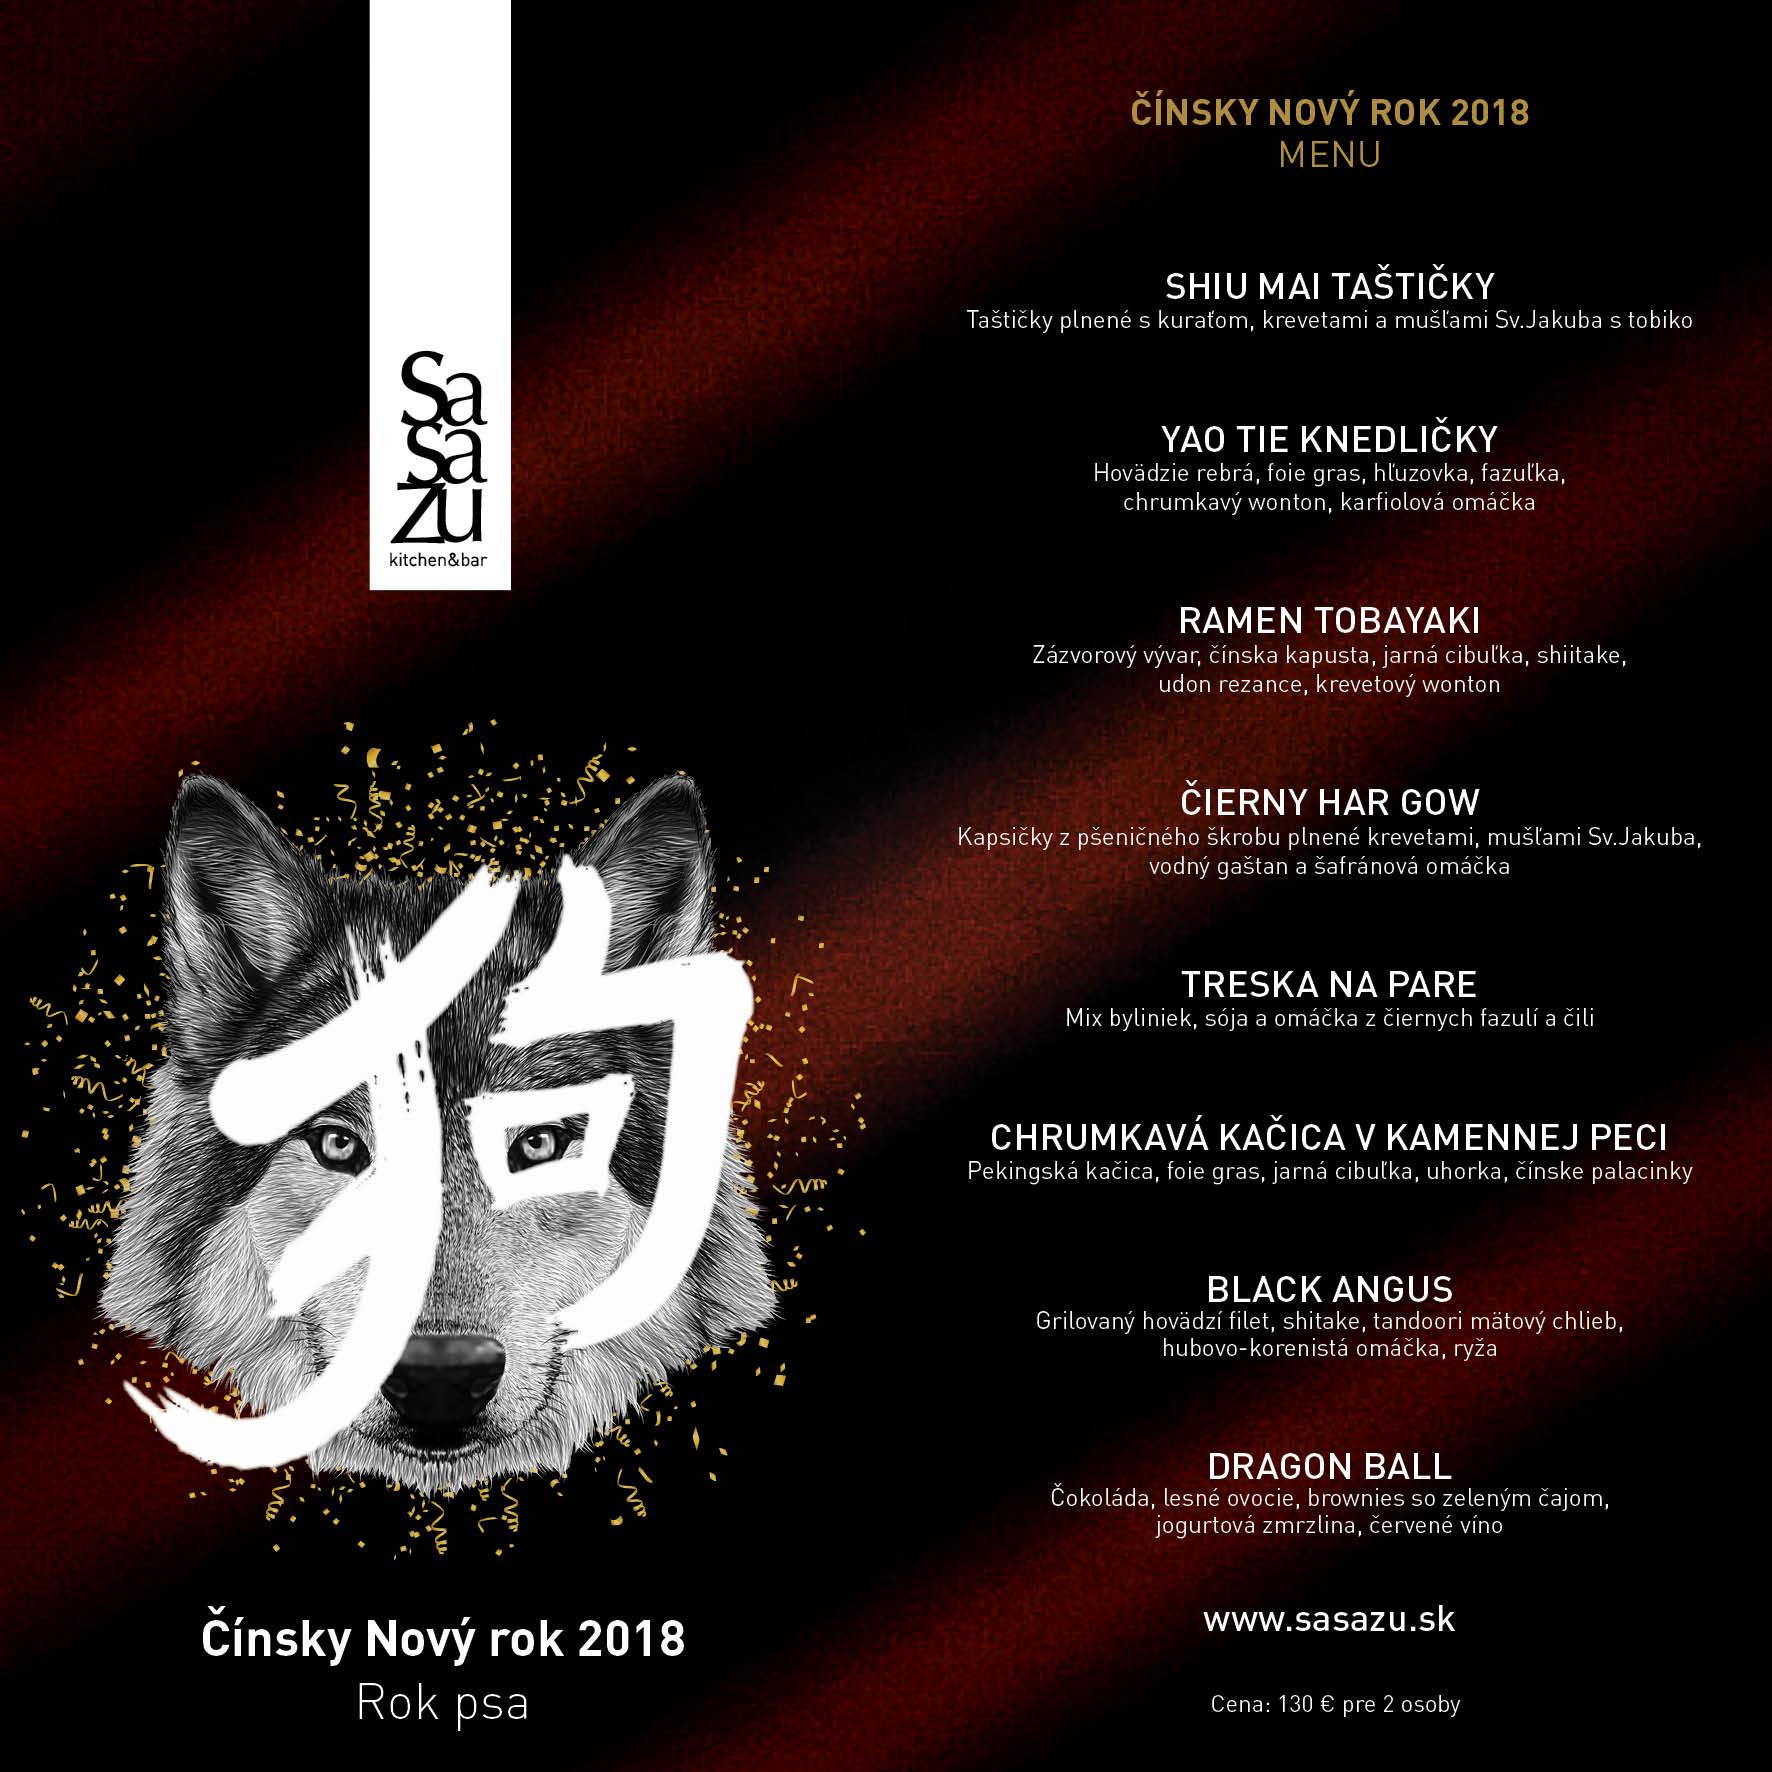 Chny menu ba